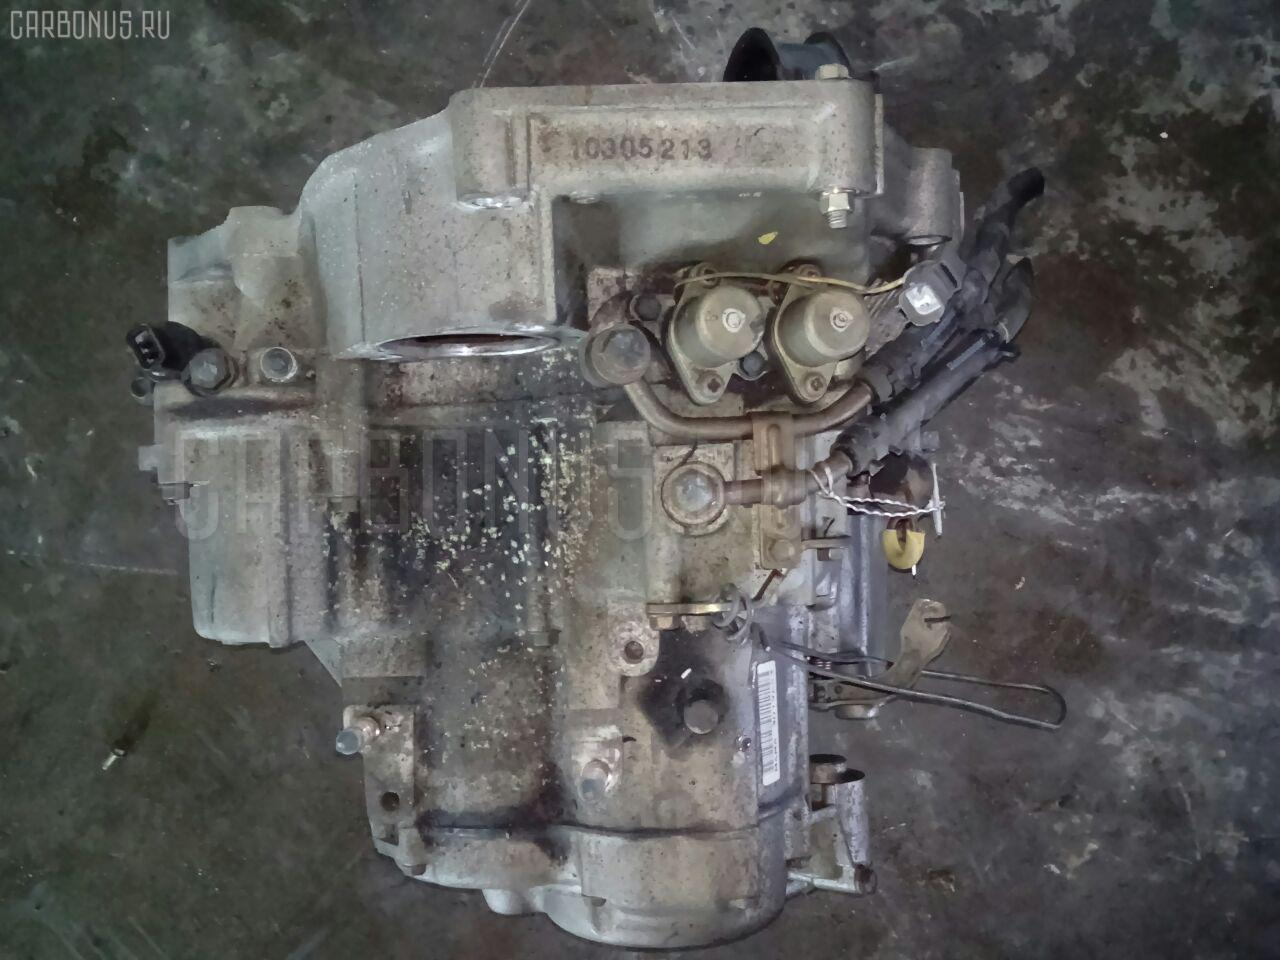 КПП автоматическая HONDA CIVIC EK2 D13B Фото 6